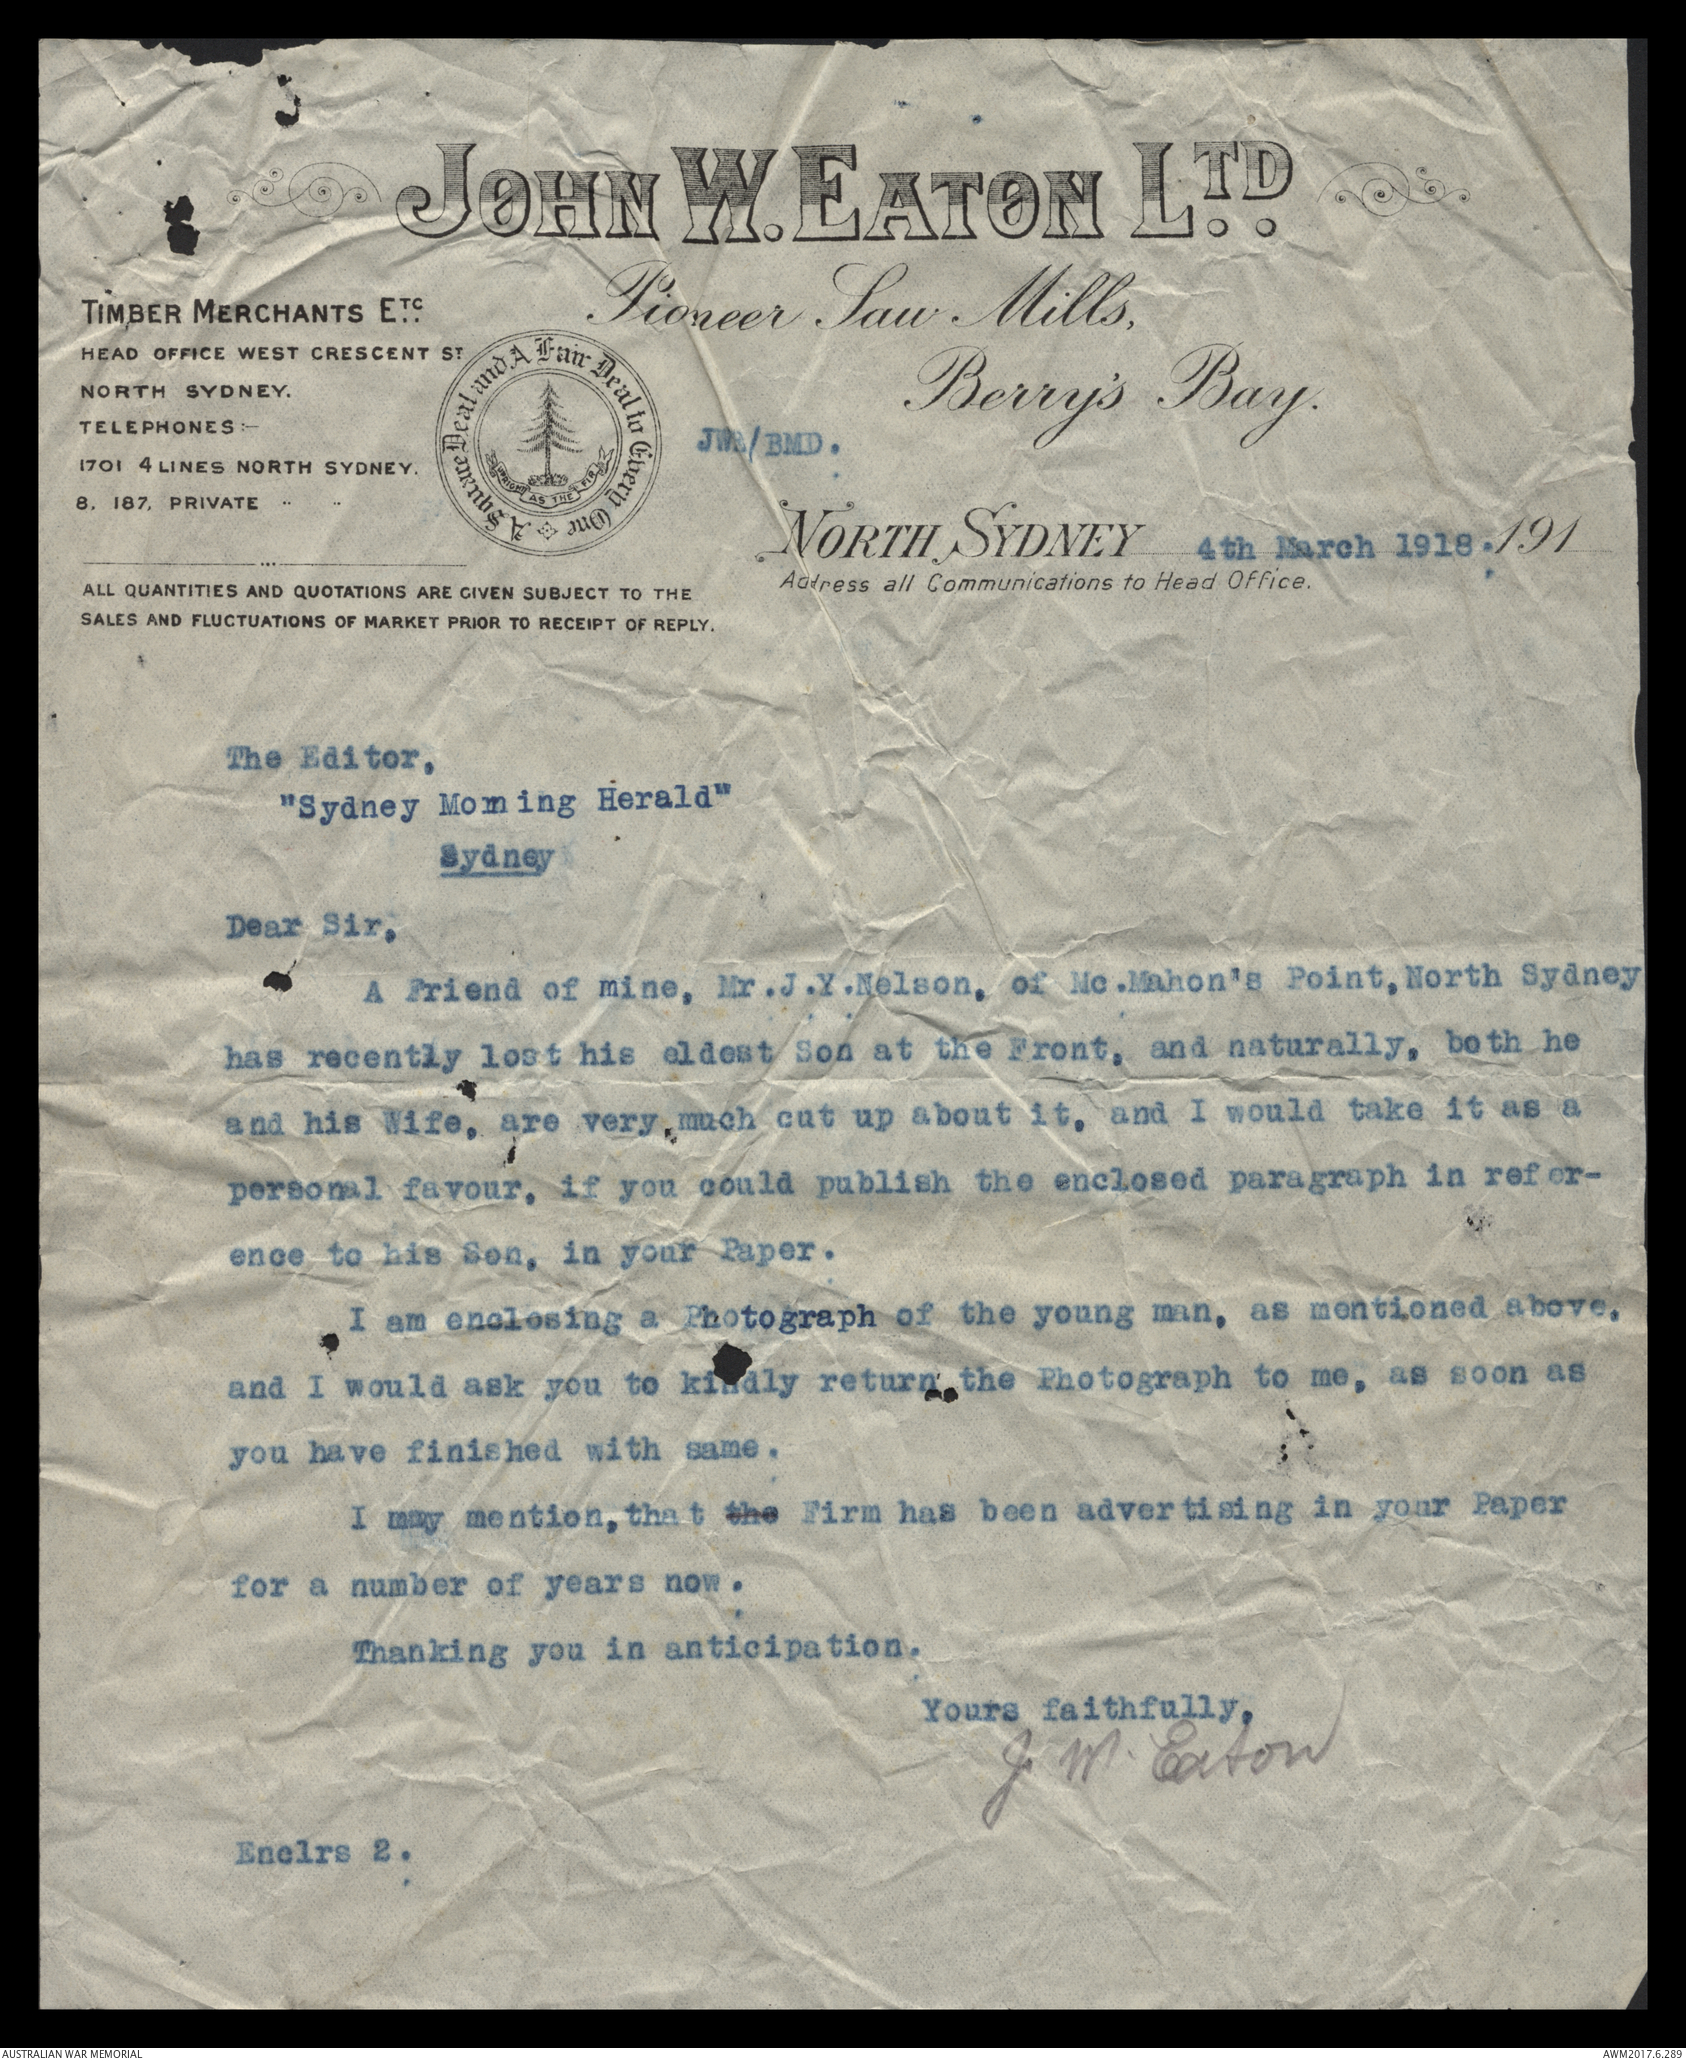 A letter to john wayne